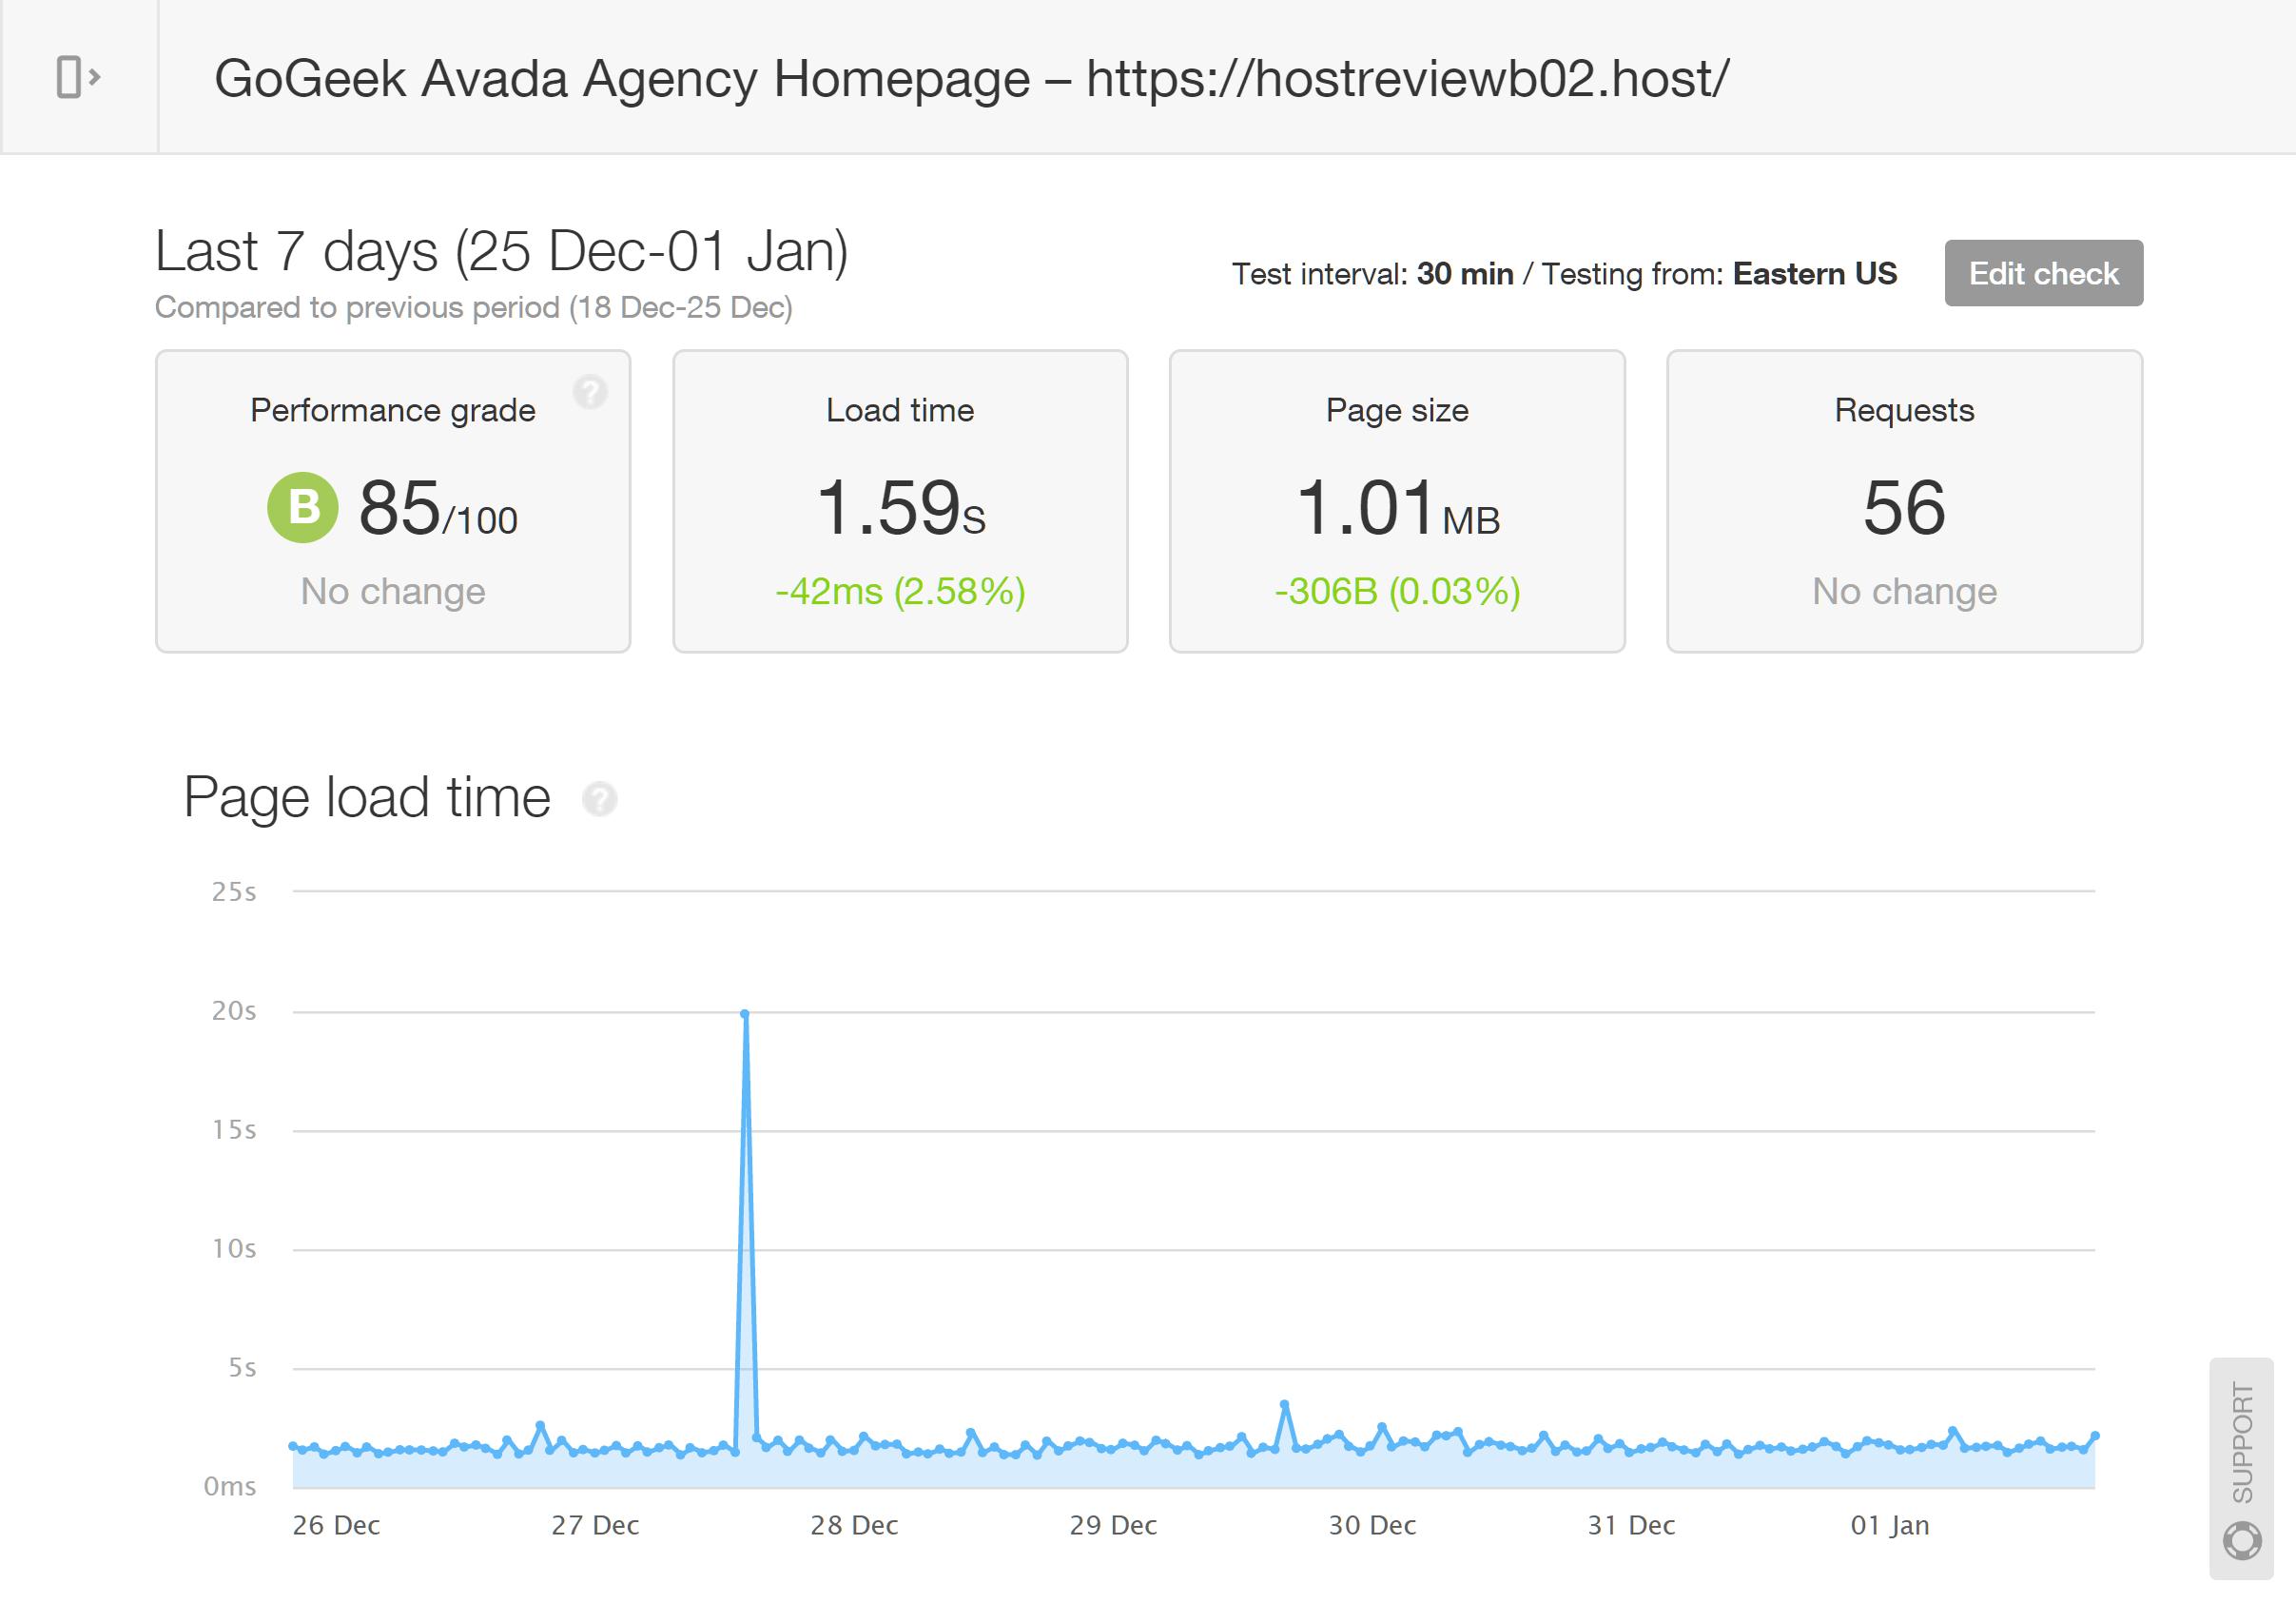 Avada Homepage GoGeek Test Results